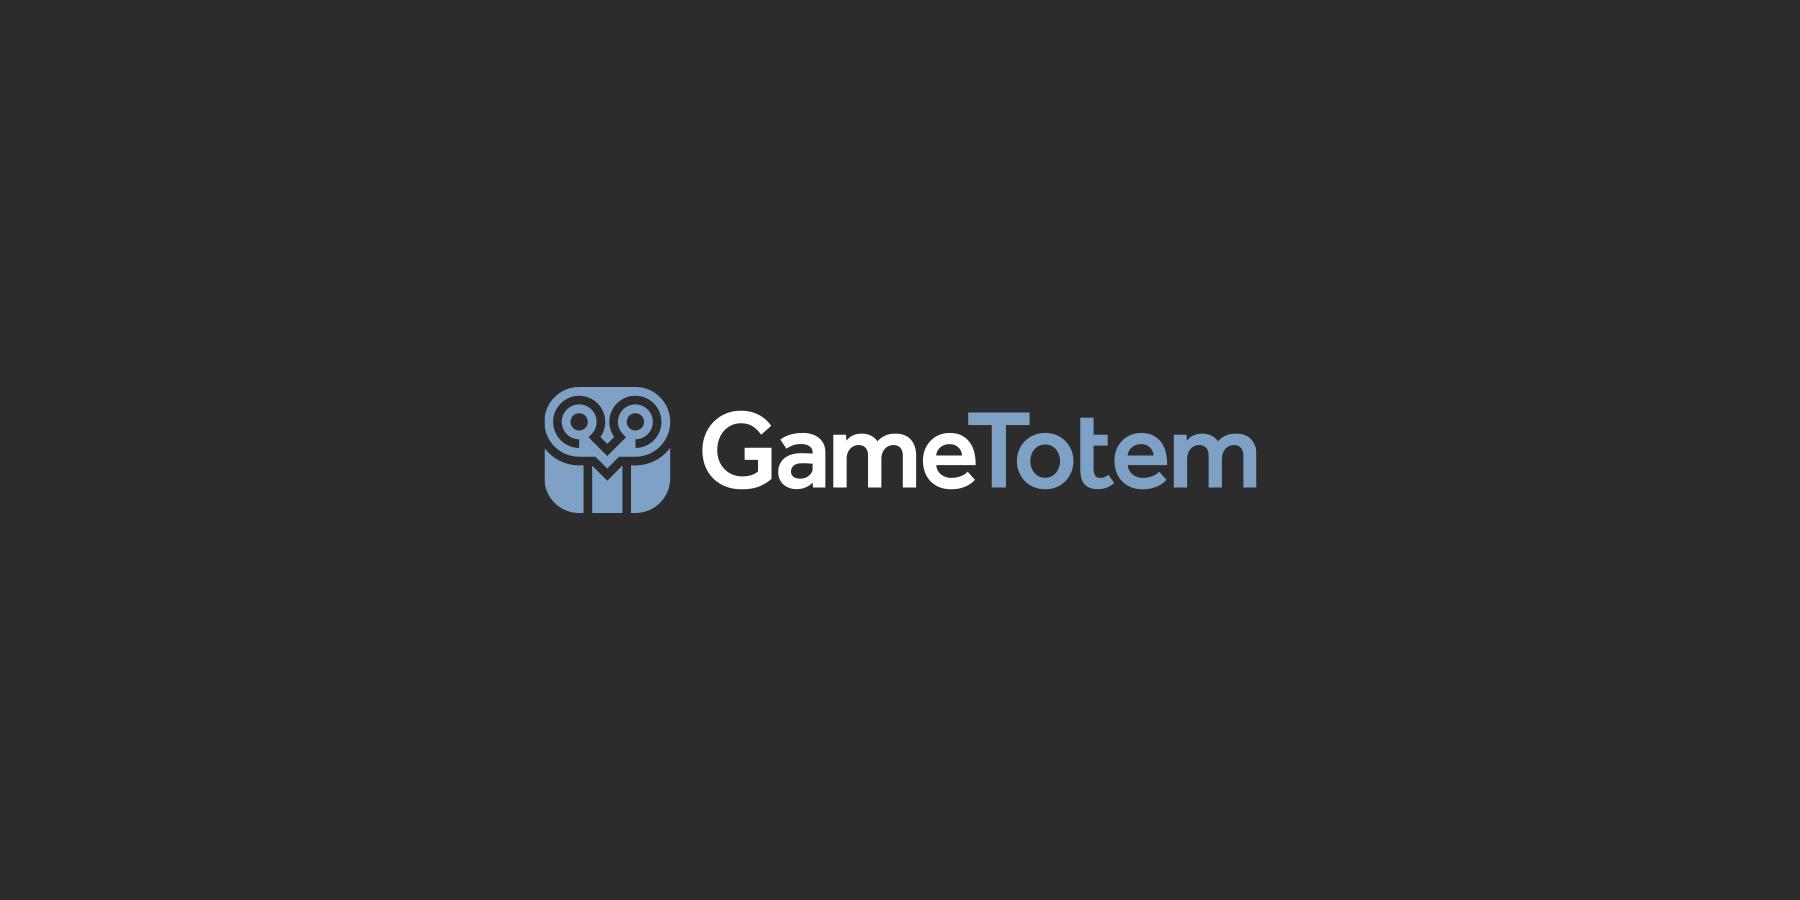 gametotem-logo-design-03